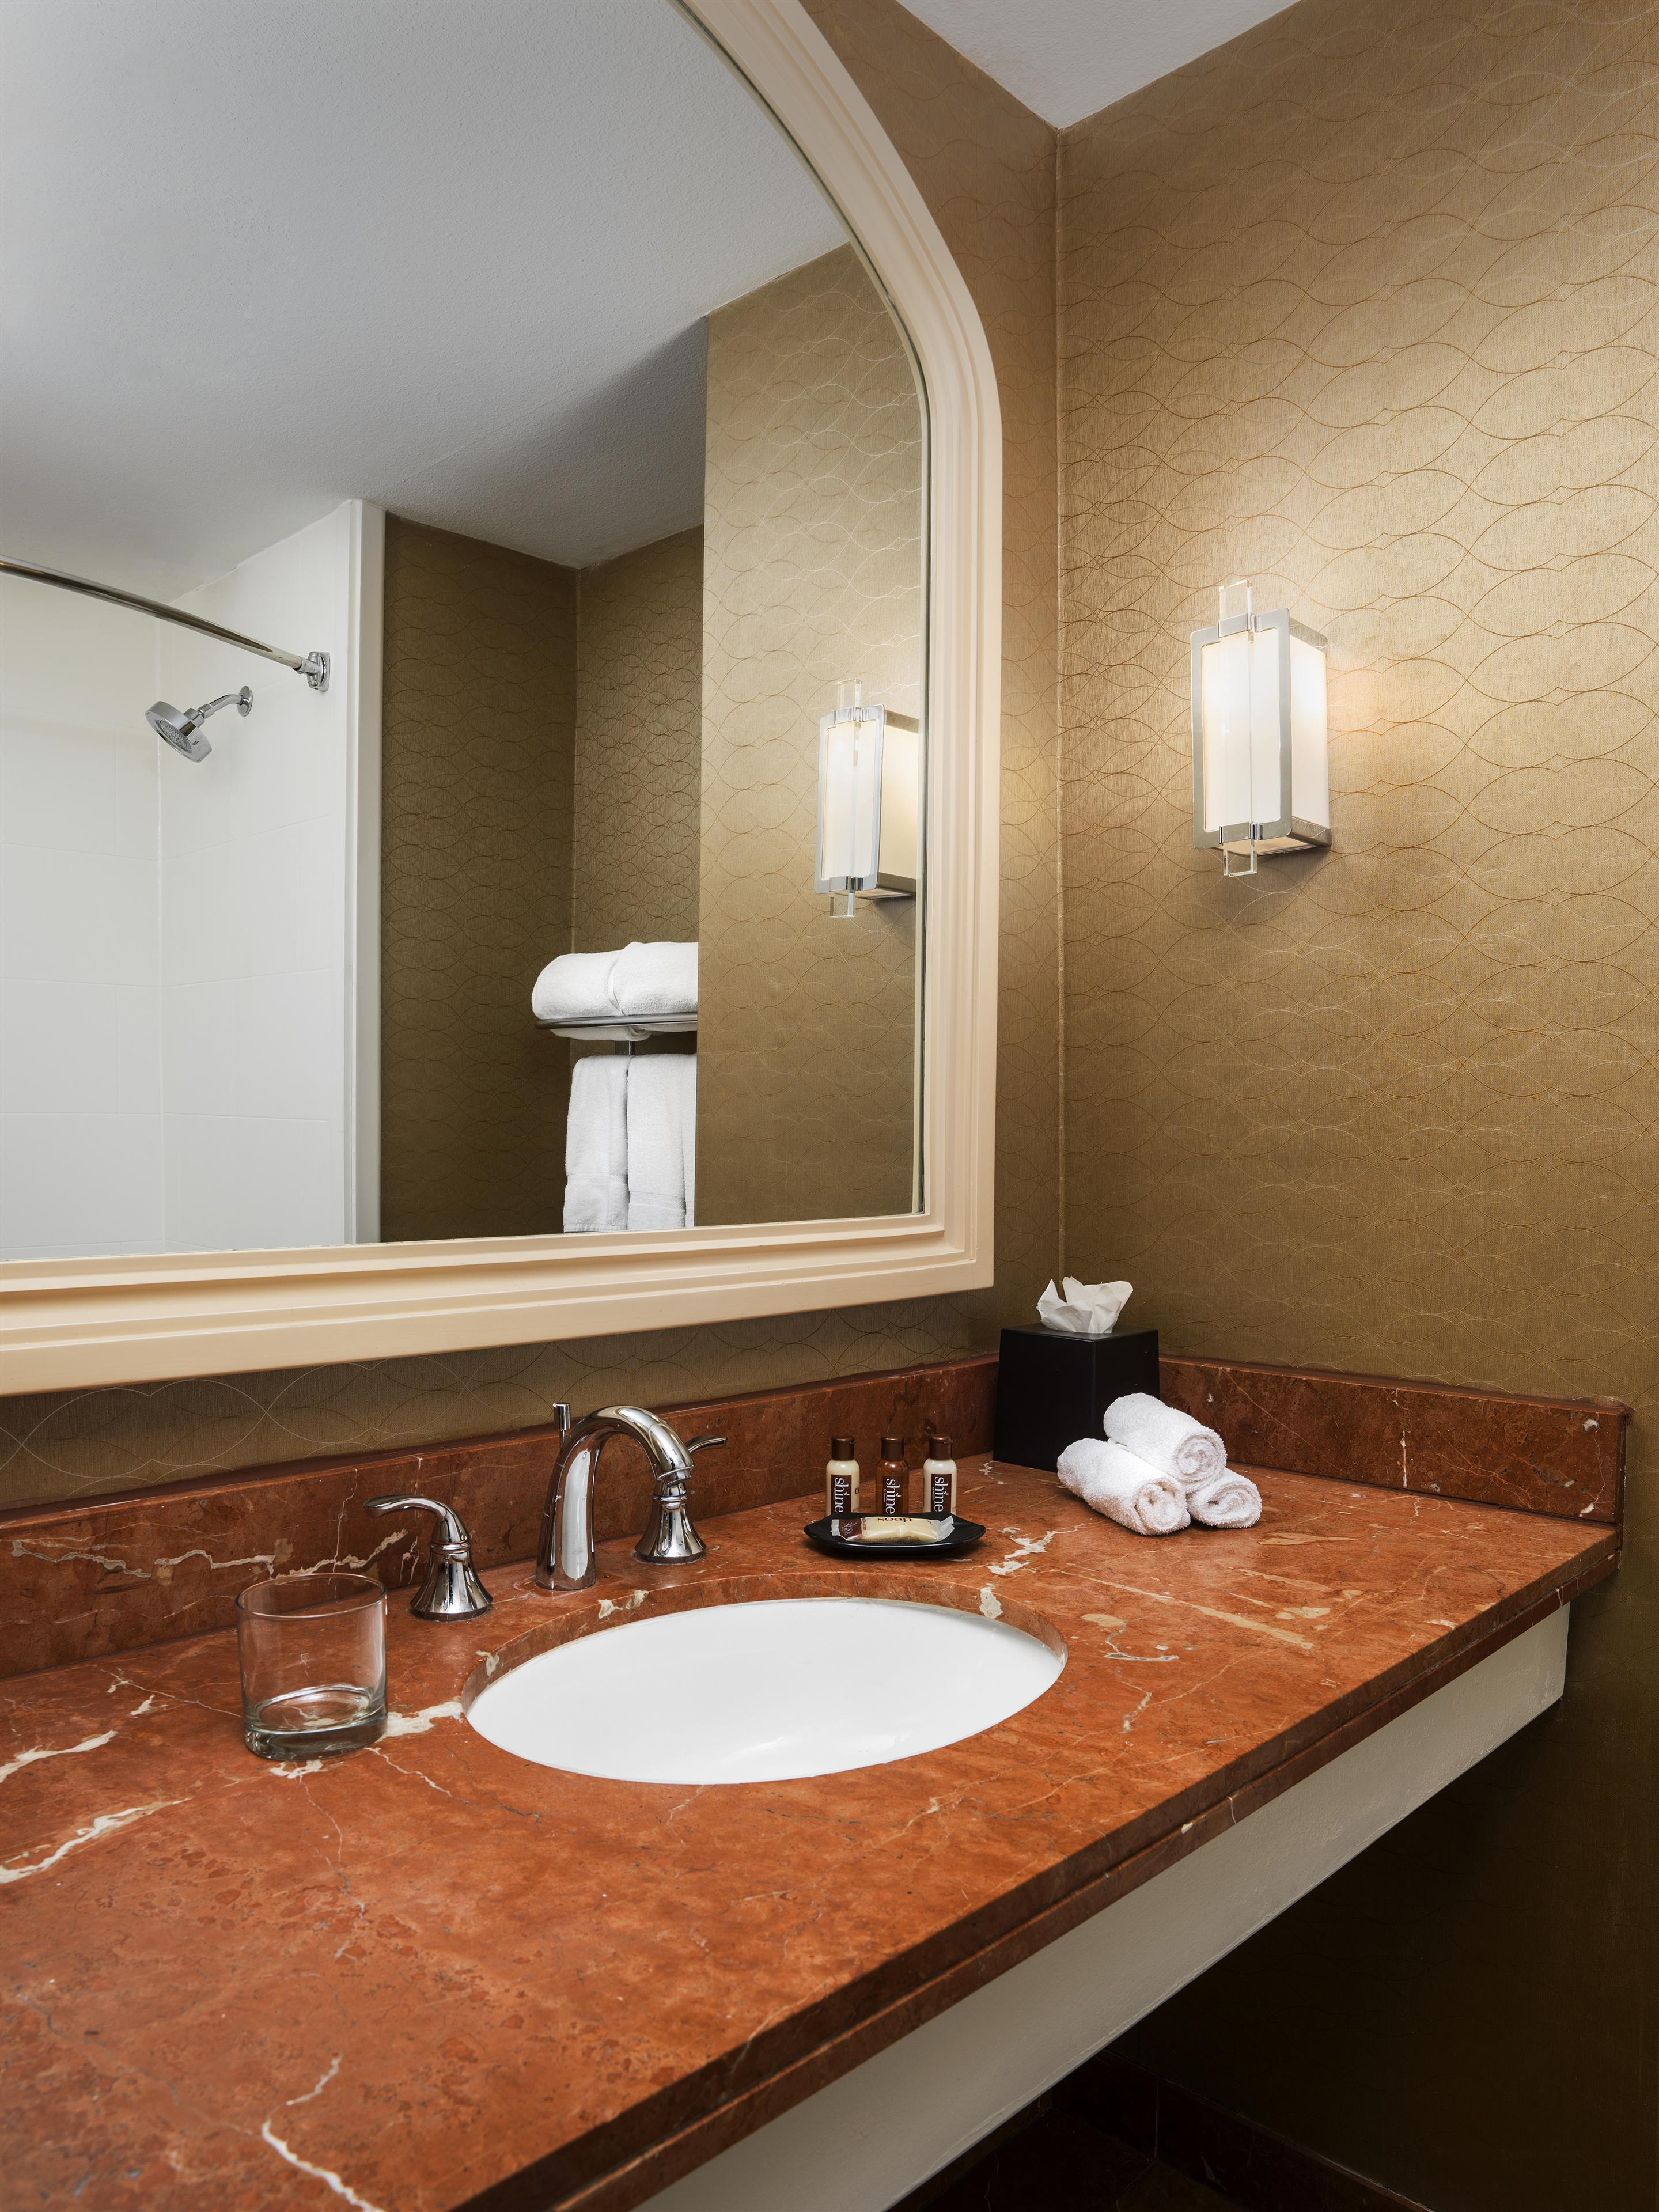 Sheraton Crescent Hotel image 10